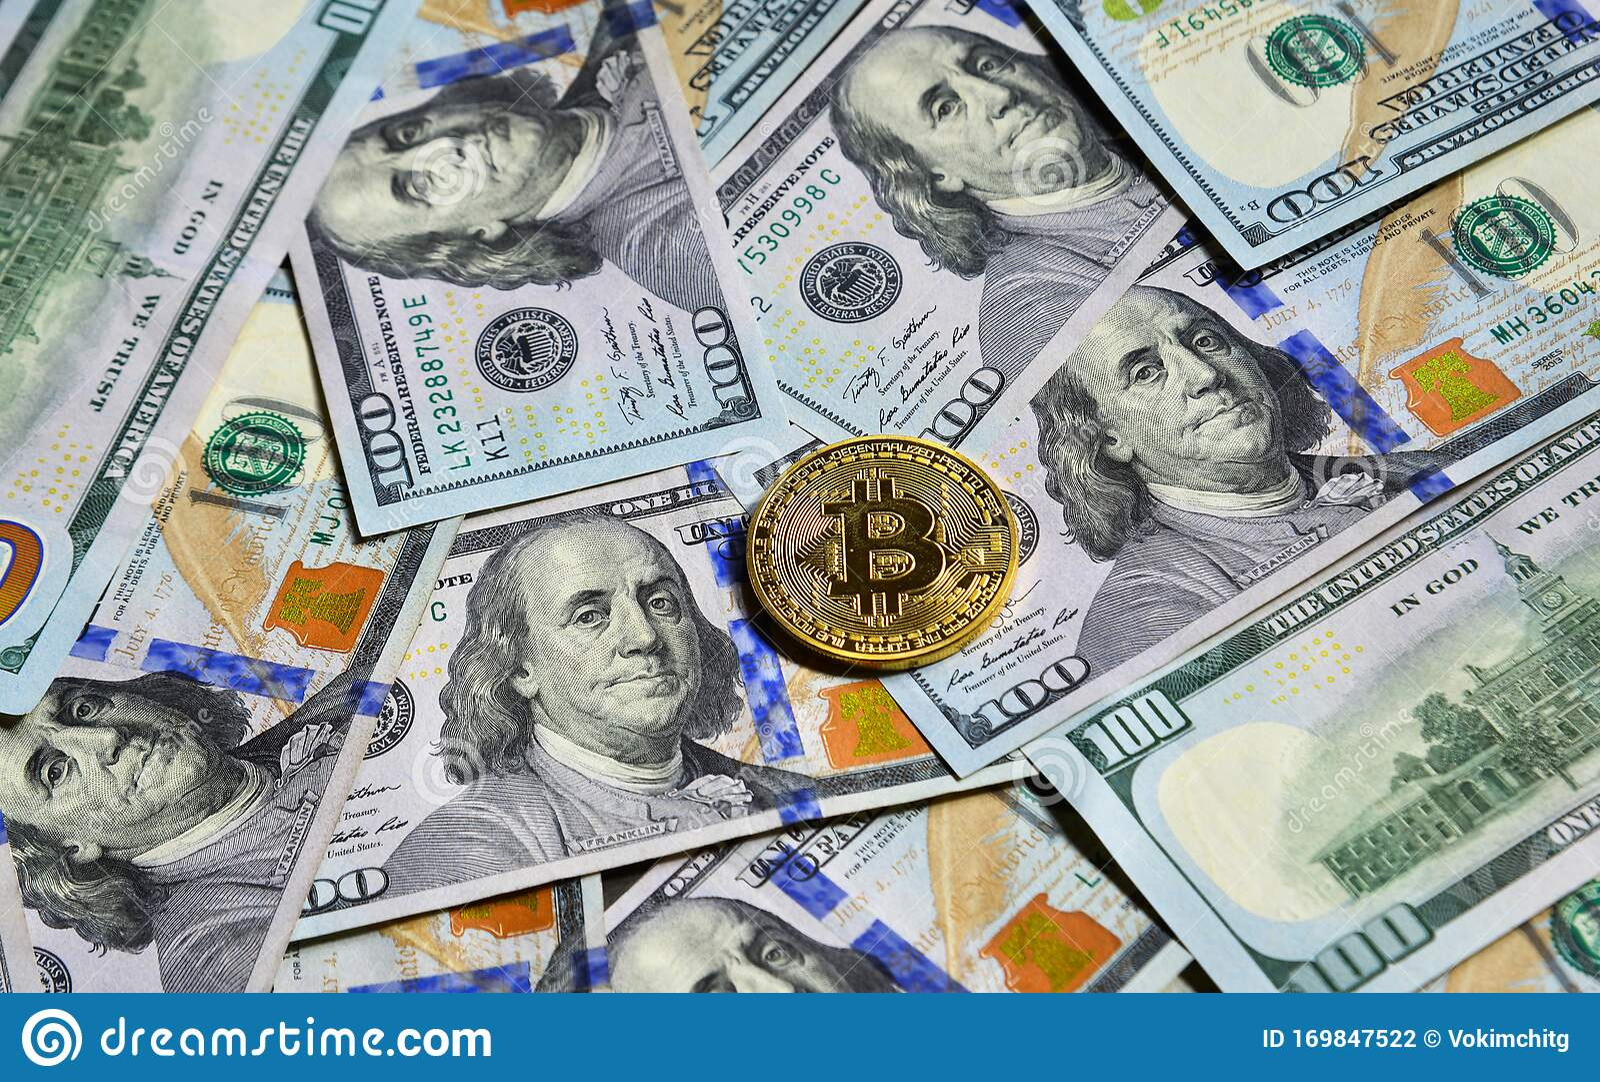 bitcoin price 100 dollars